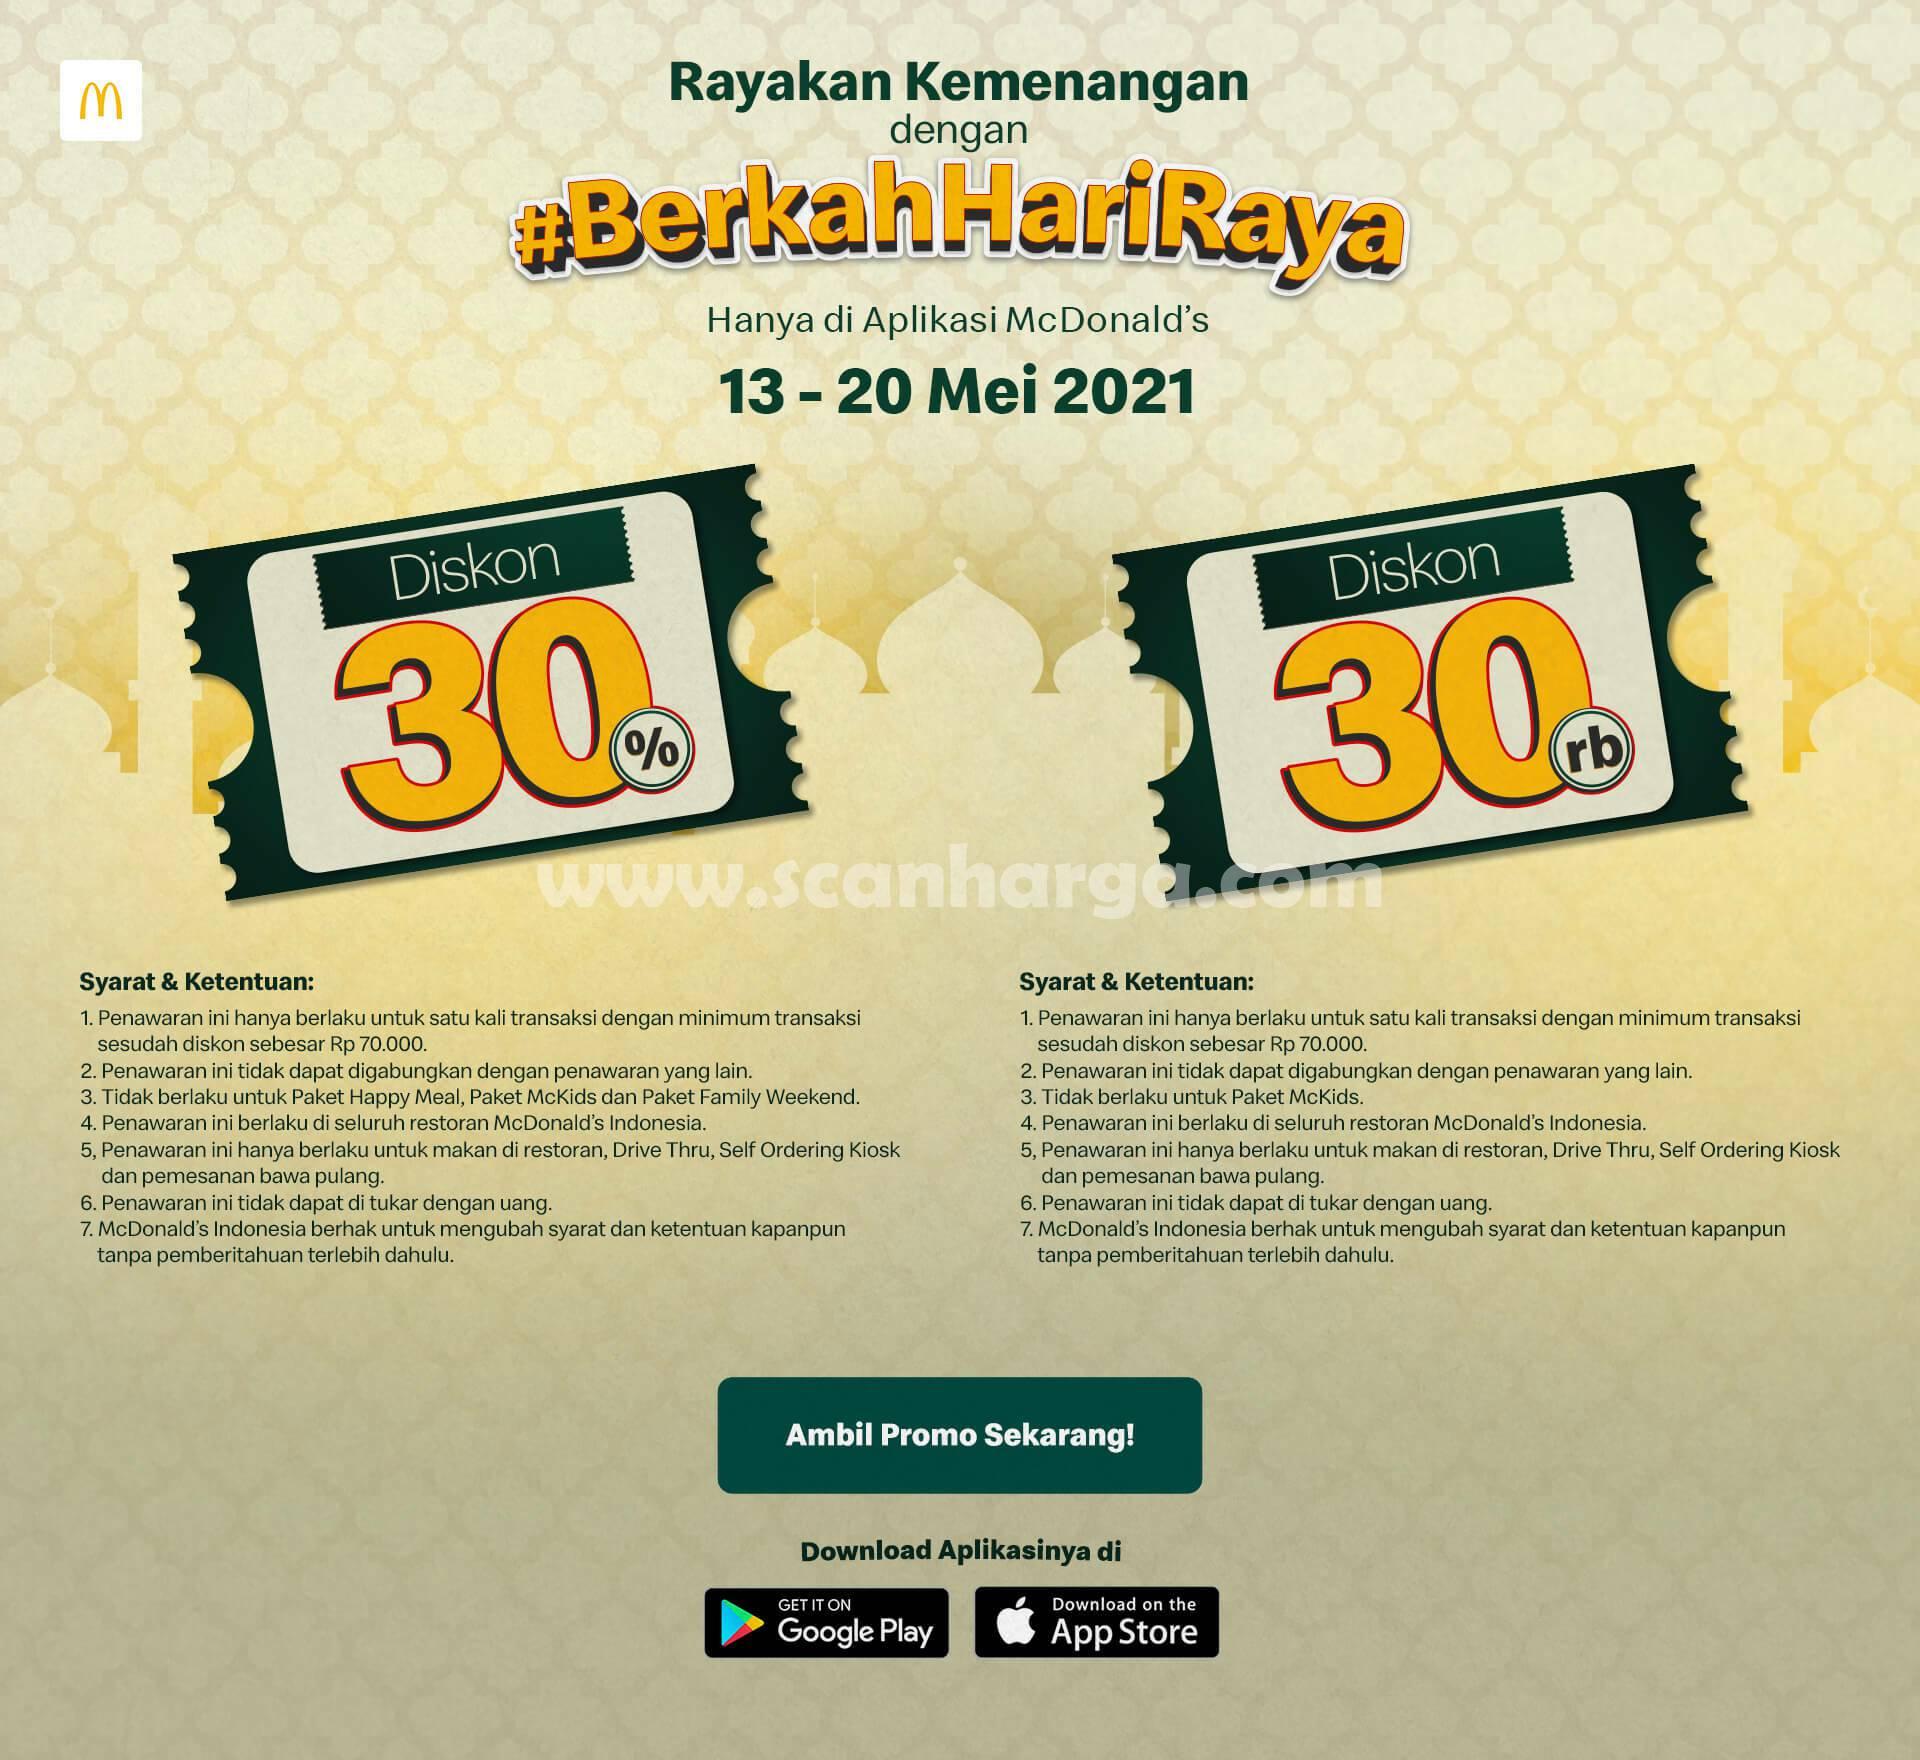 Promo McDonalds Spesial Lebaran – Pilih Diskon 30% atau Potongan Rp. 30ribu